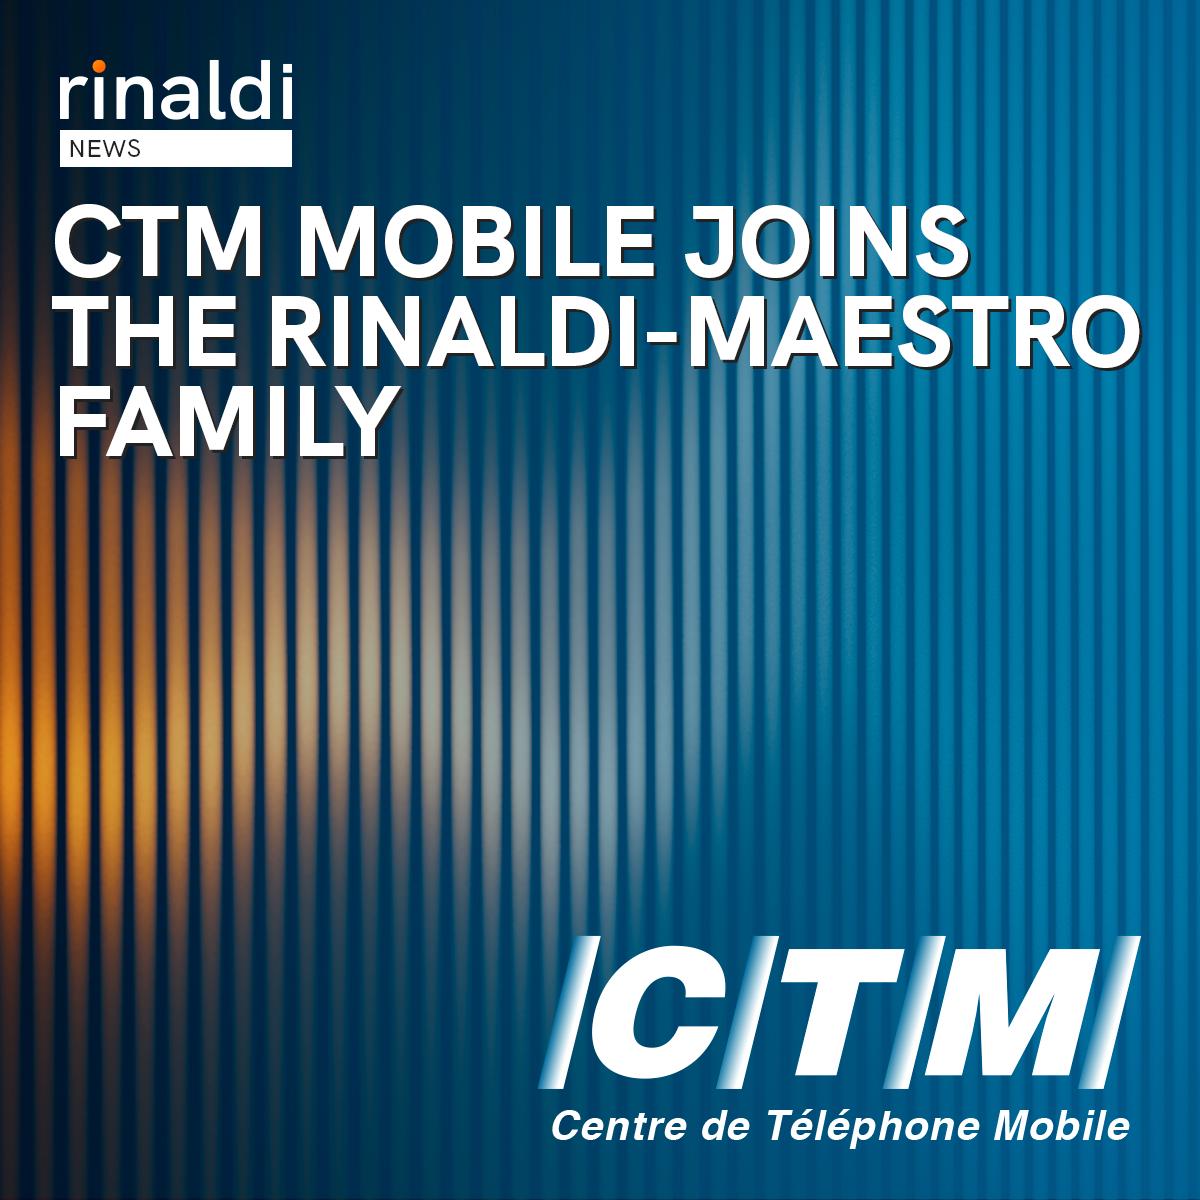 CTM Mobile joins the Rinaldi-Maestro family